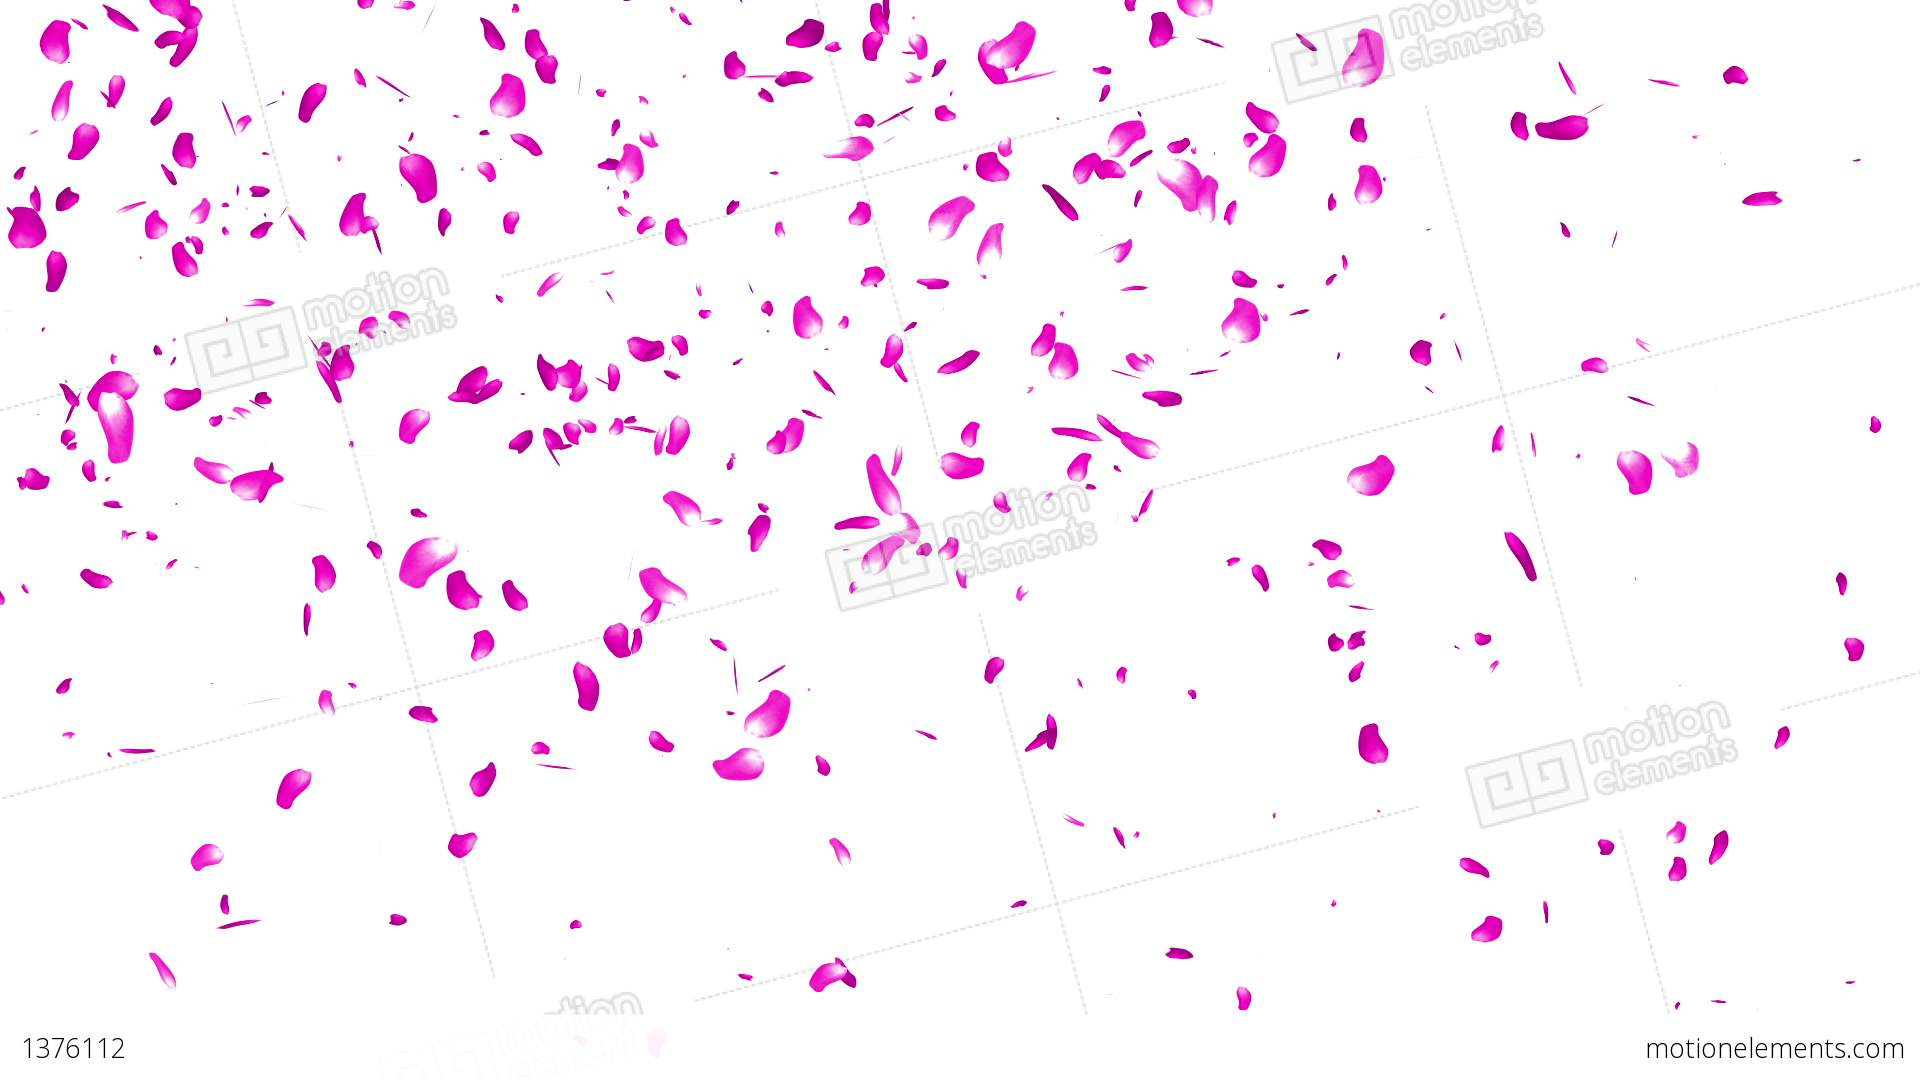 Falling Cherry Blossom Wallpaper Hd Falling Sakura Petals Cherry Blossoms 3 Stock Animation